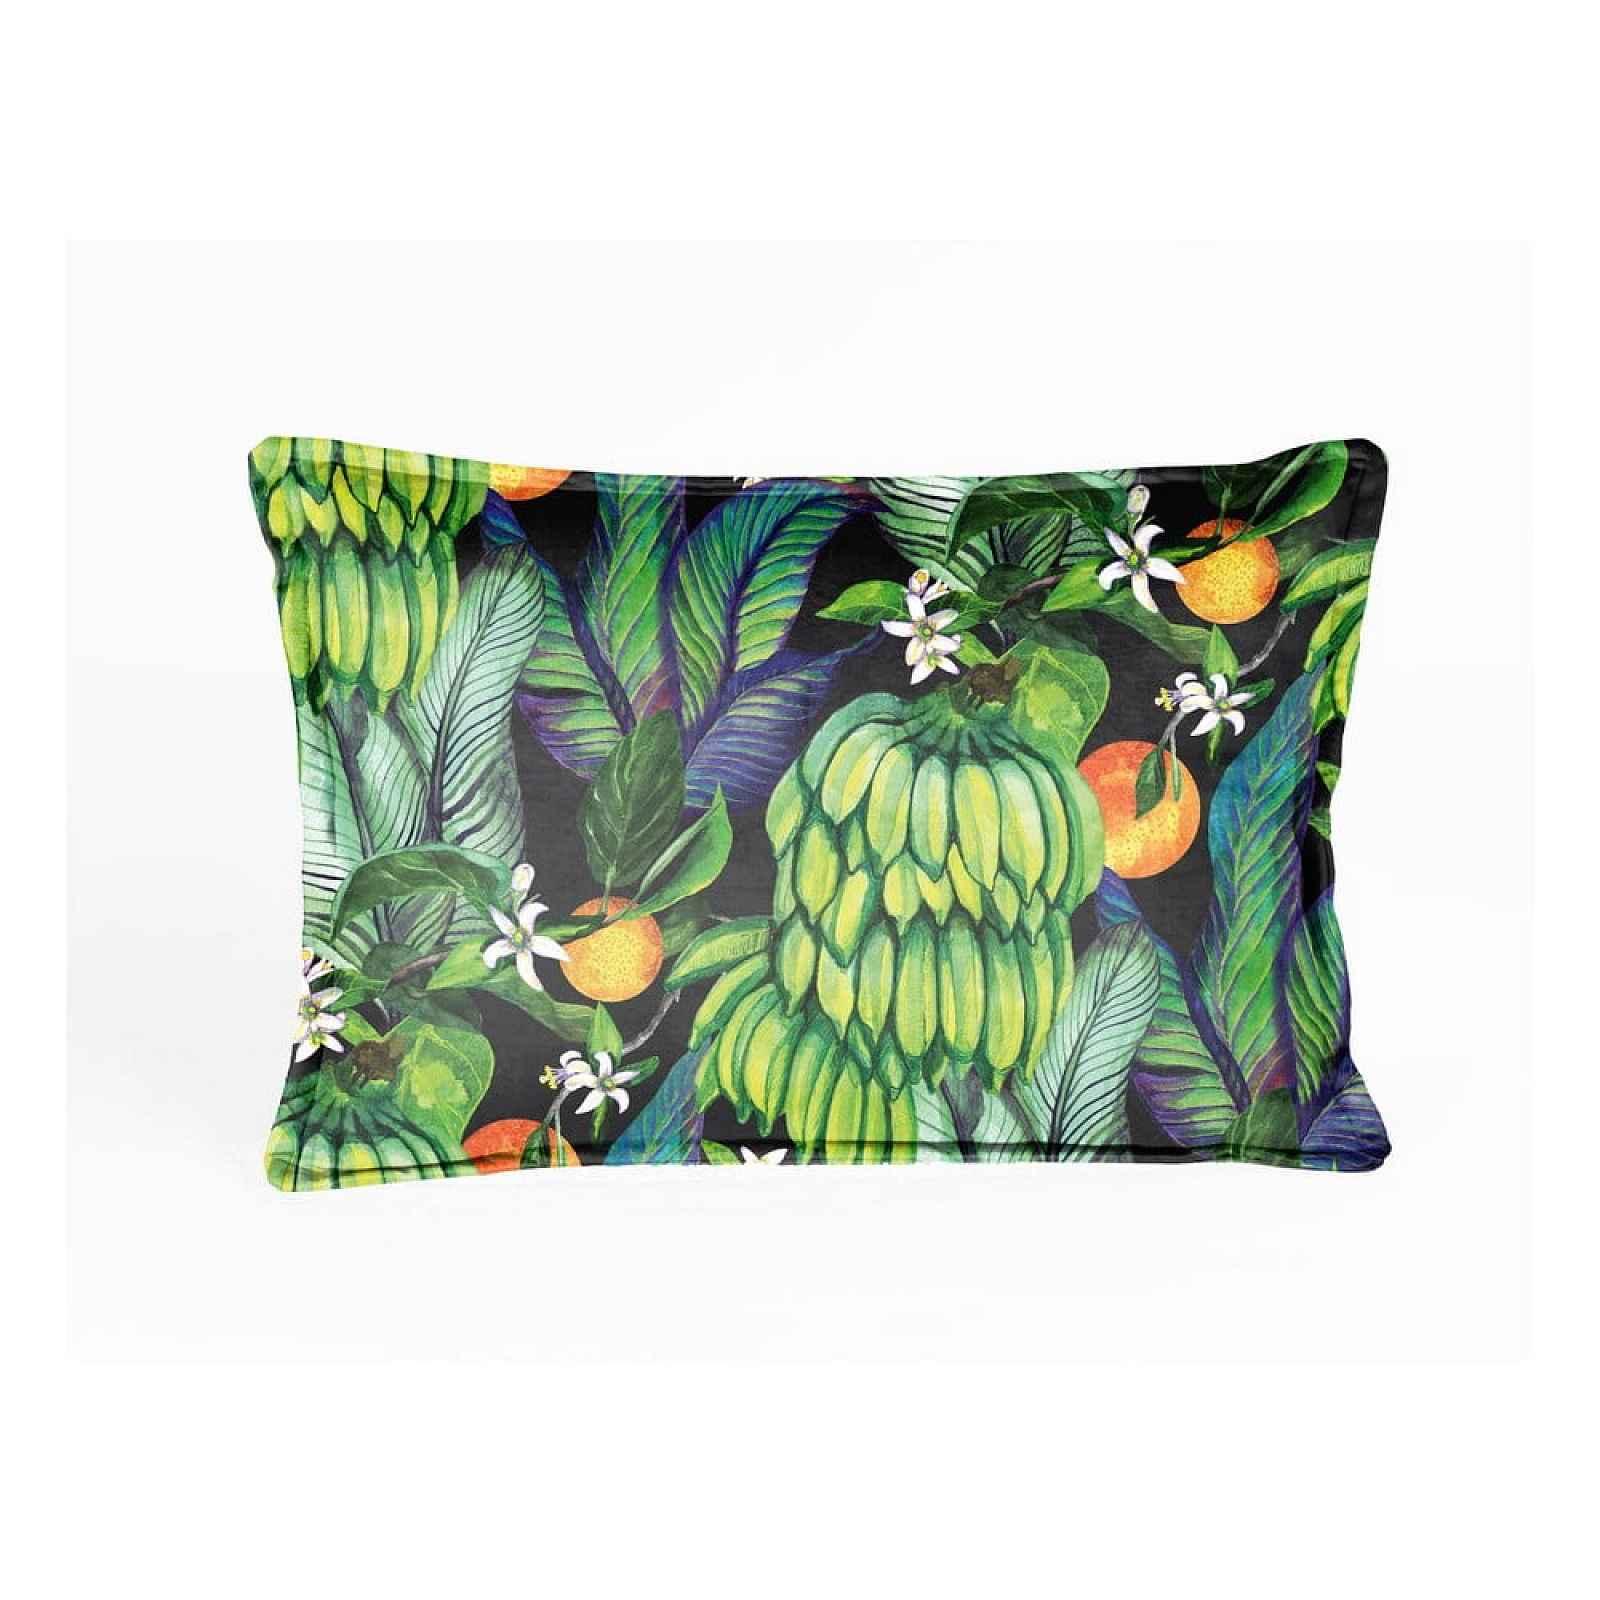 Zelený sametový polštář Velvet Atelier Banana,50x35cm